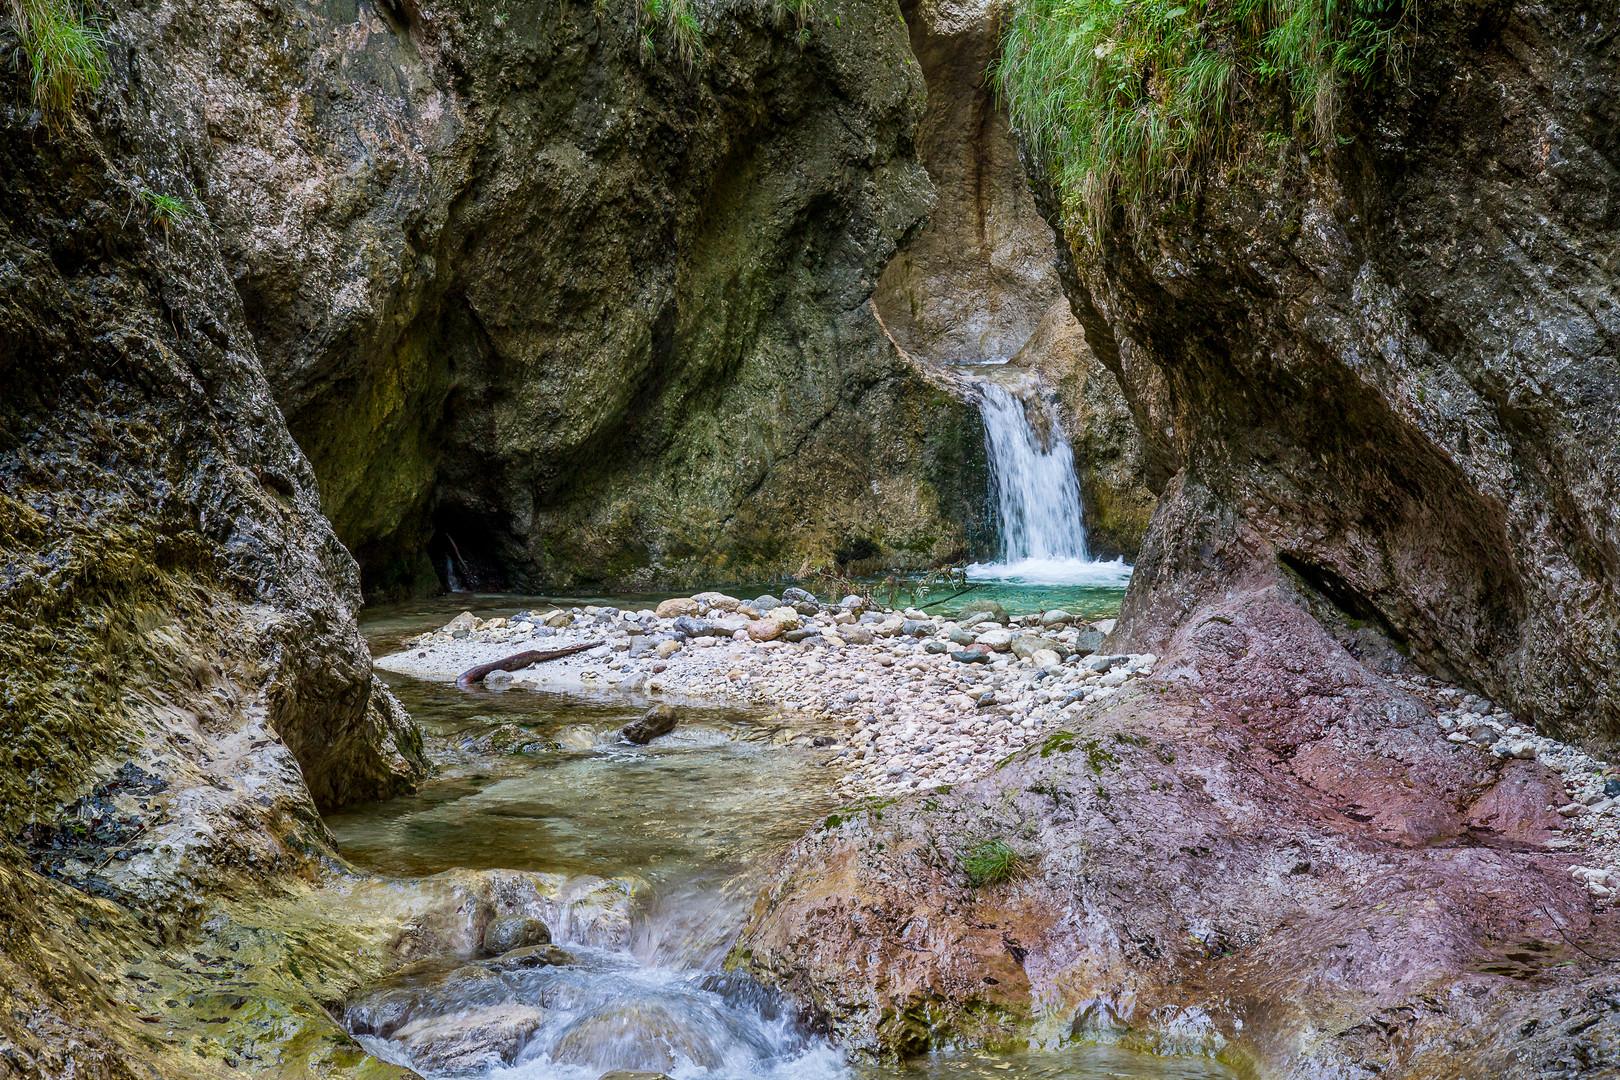 Klamm bei Berchtesgaden Foto & Bild | wasser, natur ...